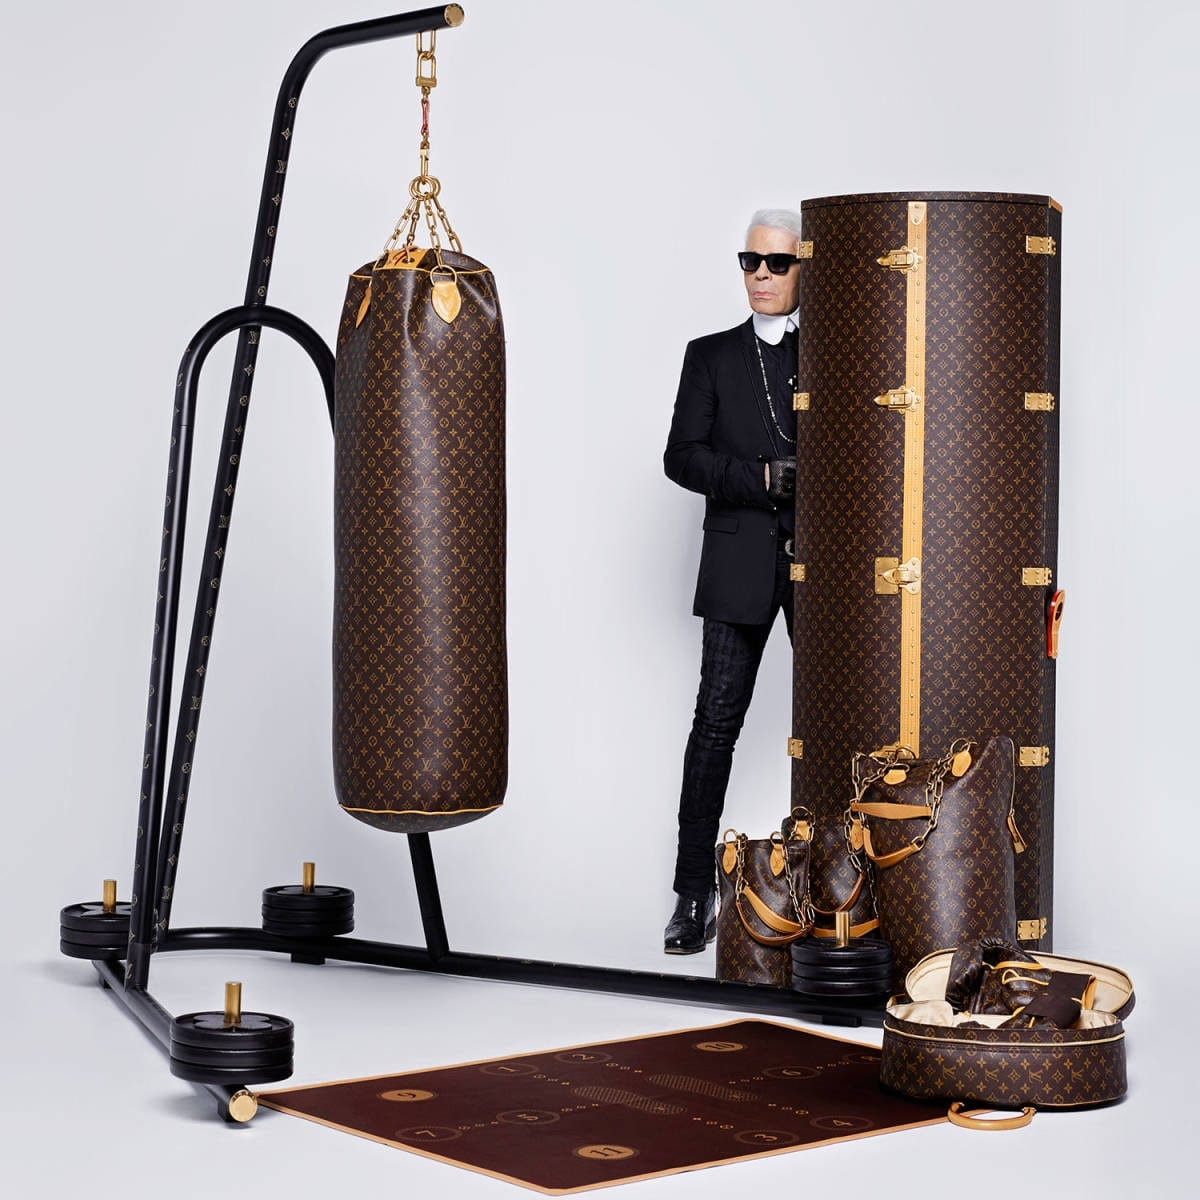 lv1 - LV Luxury Punching Bag, cu design semnat Karl Lagerfeld